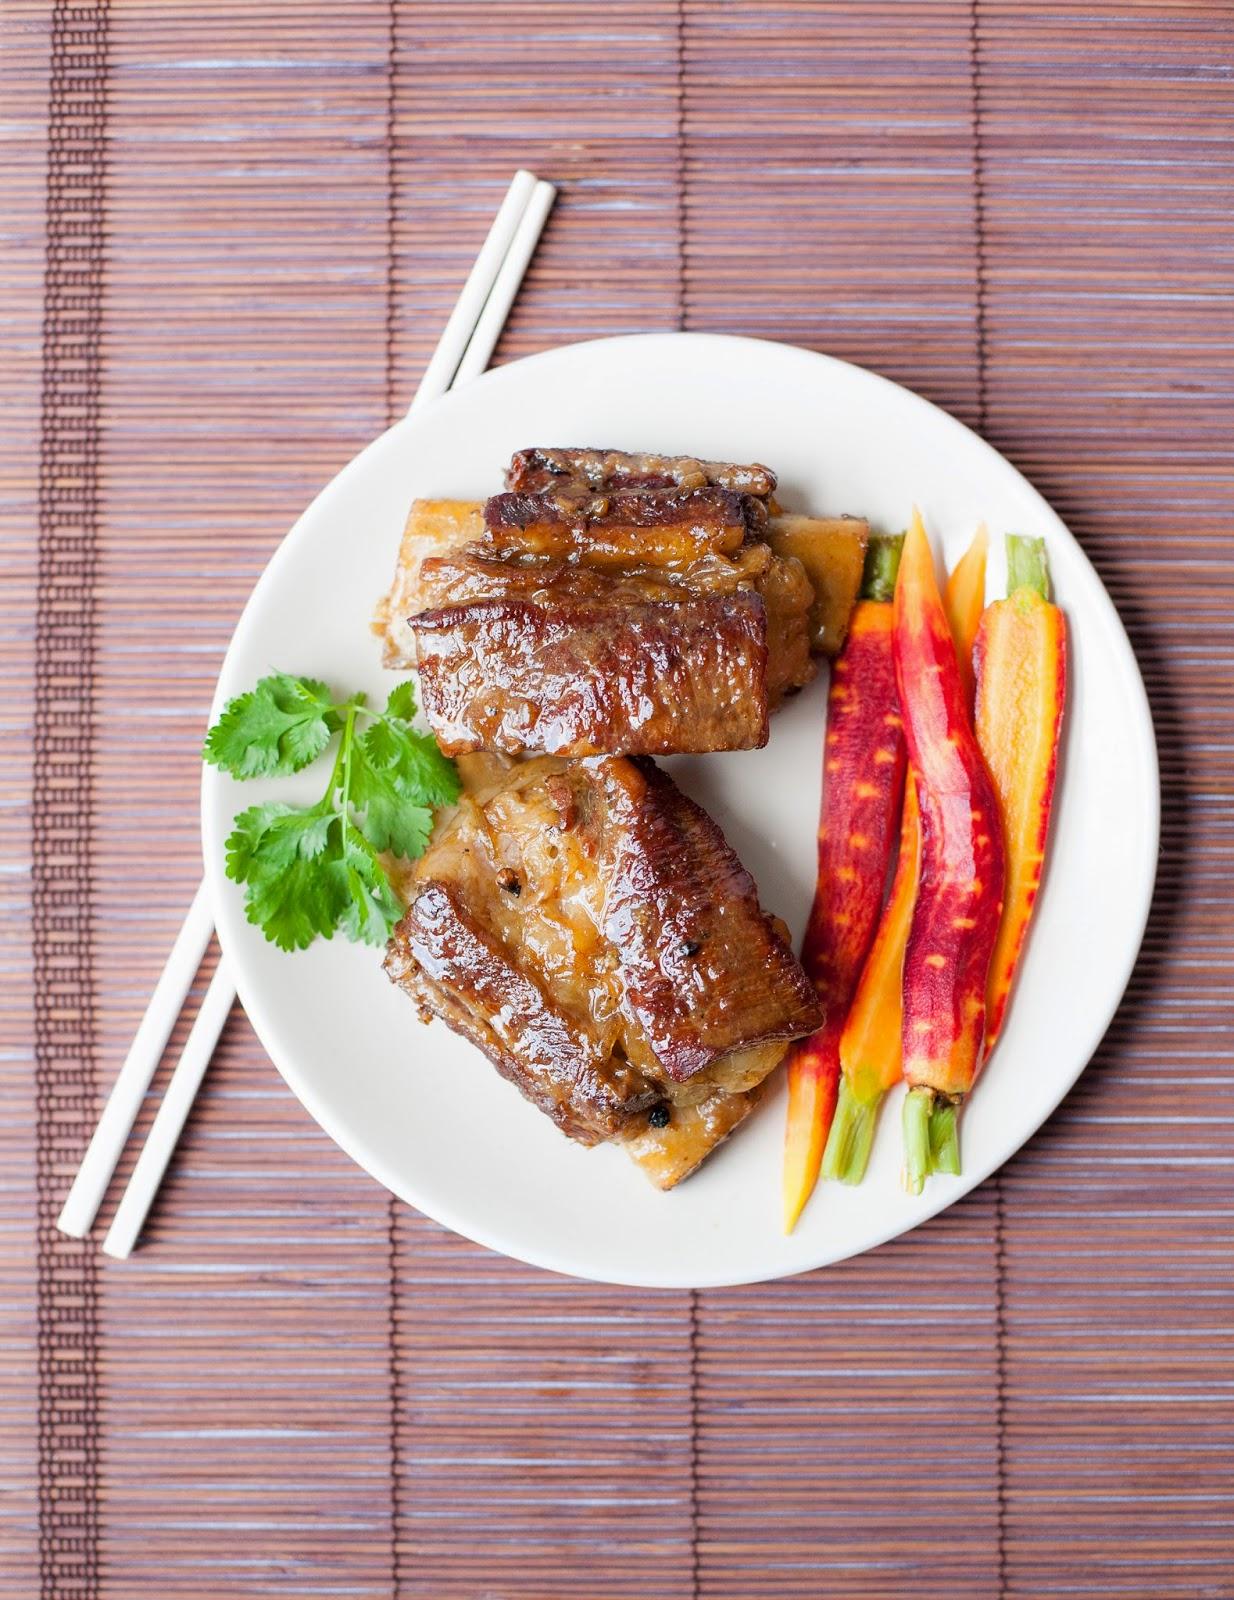 kratiem prik thai short ribs with quick pickled carrots a